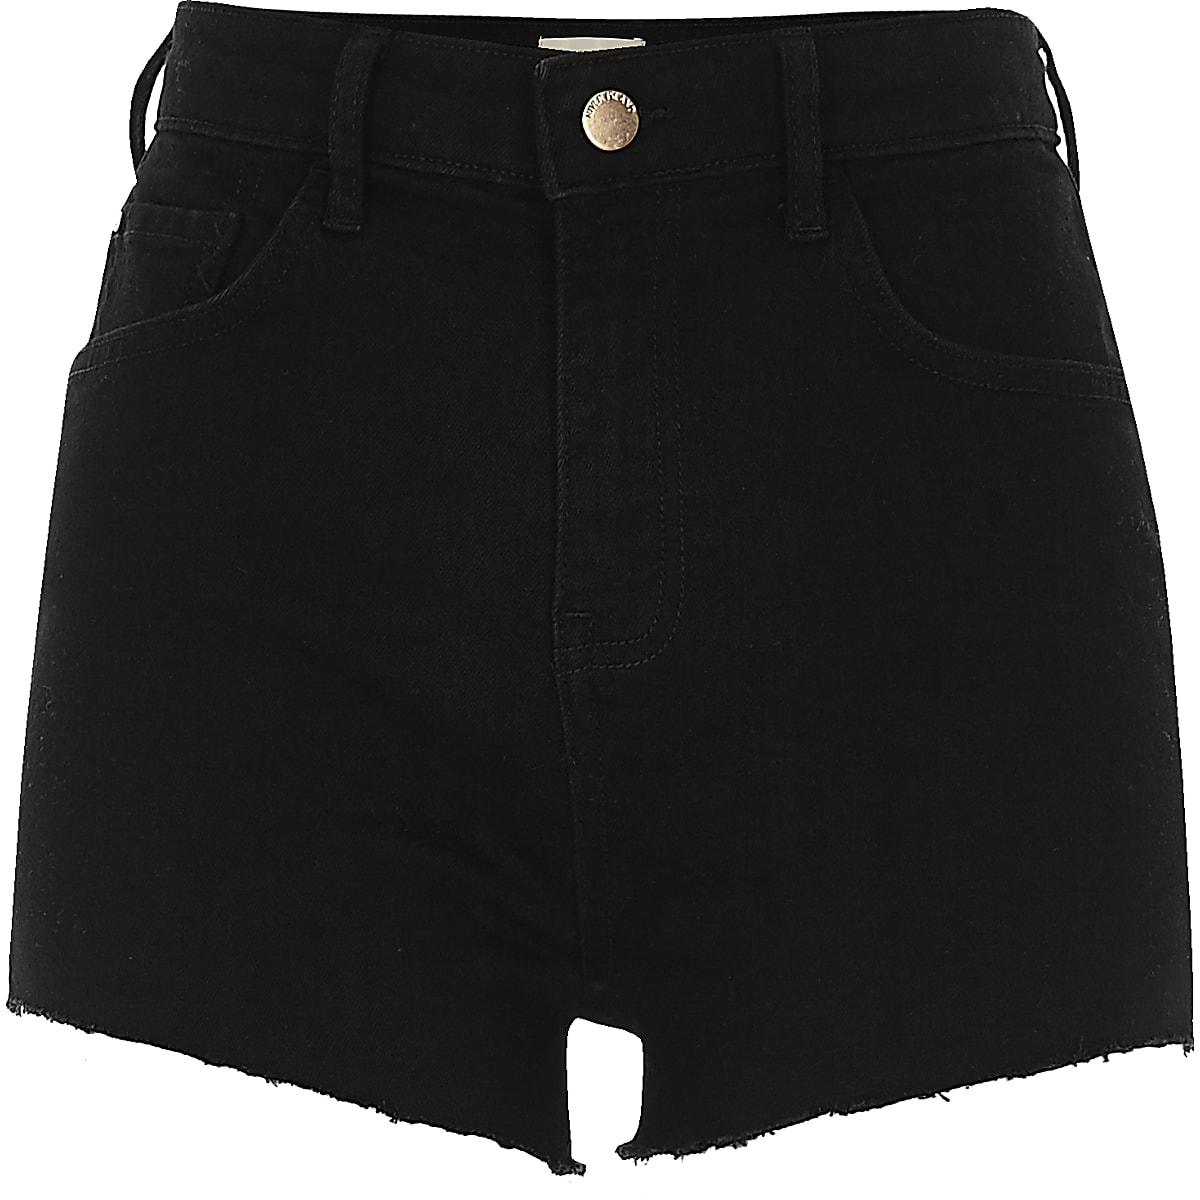 c0b53b3388e Black high waisted stretch hot pants - Denim Shorts - Shorts - women